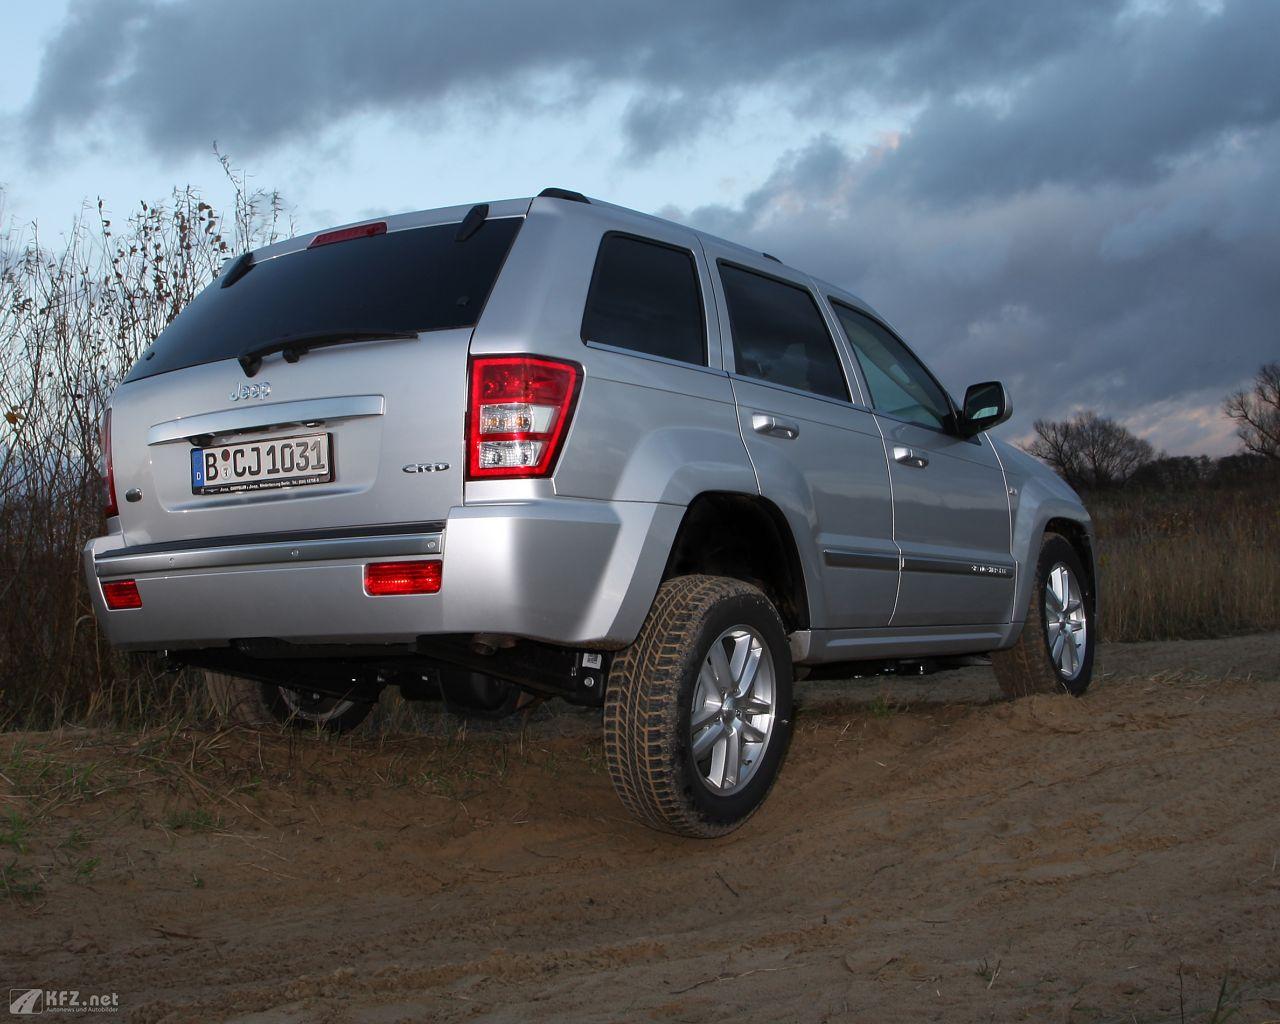 jeep-grand-cherokee-1280x1024-13